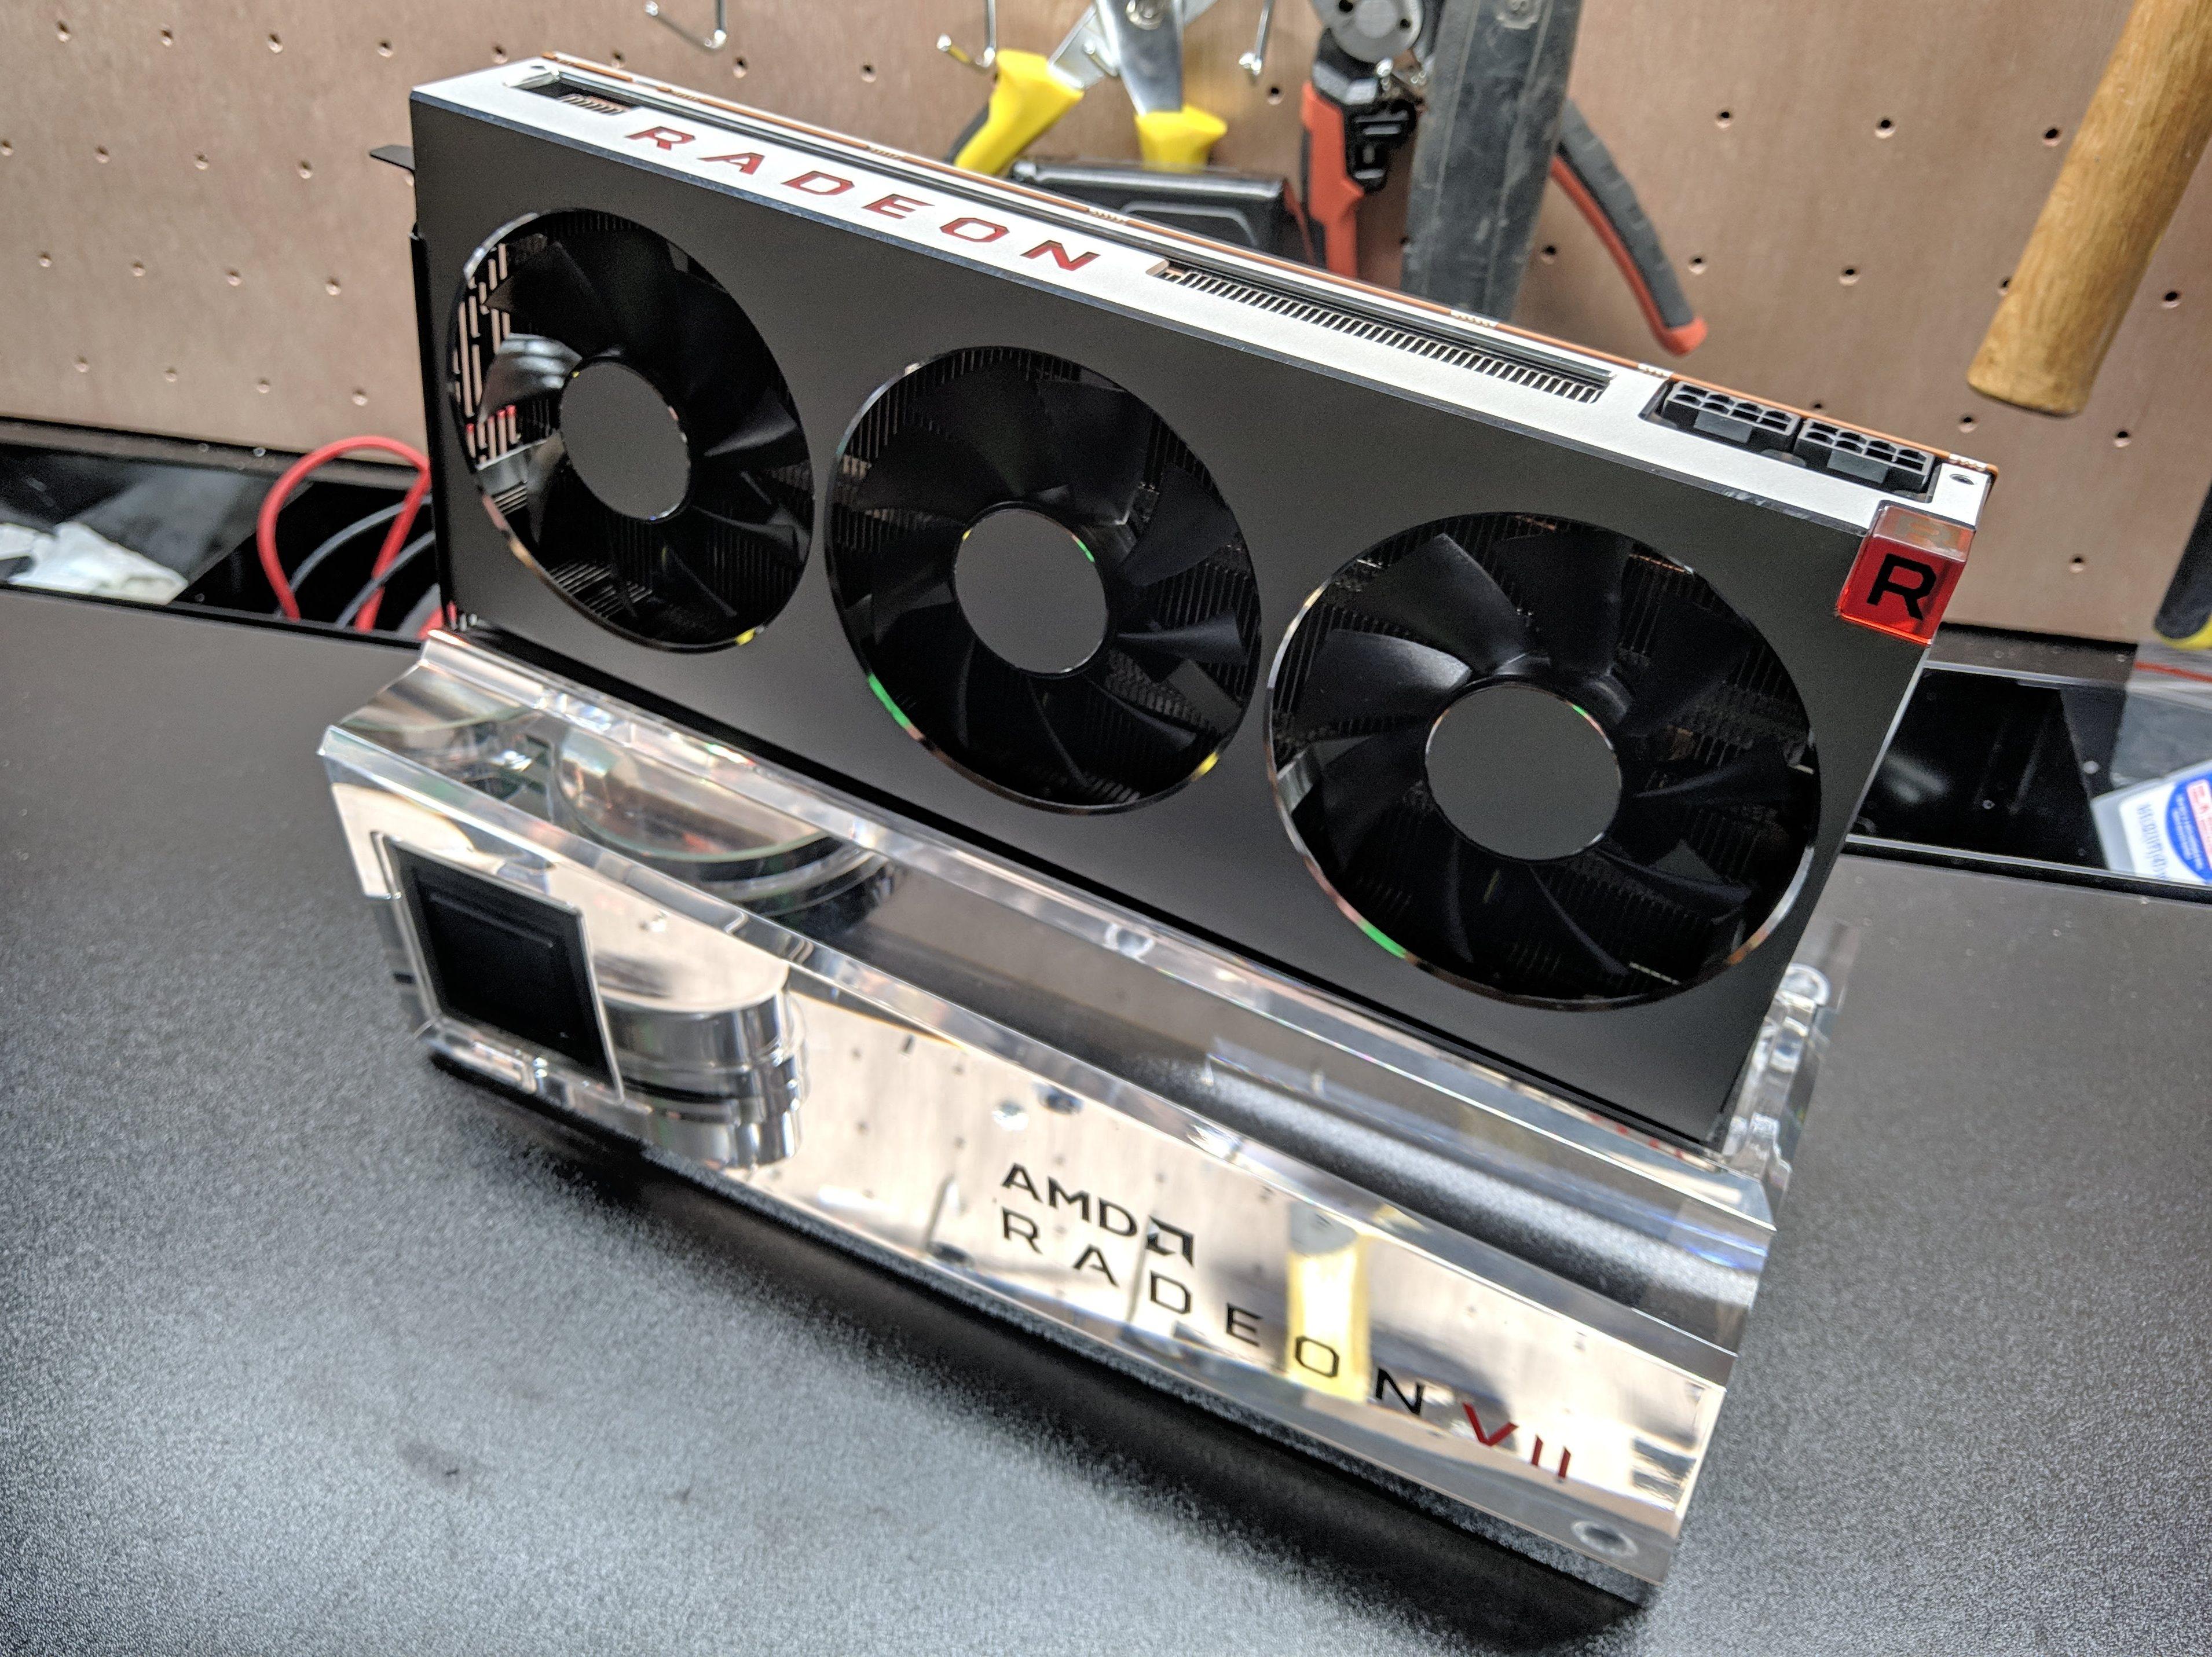 Radeon Vii Vs Rtx 2080 Which 700 Gpu Should You Get Venturebeat